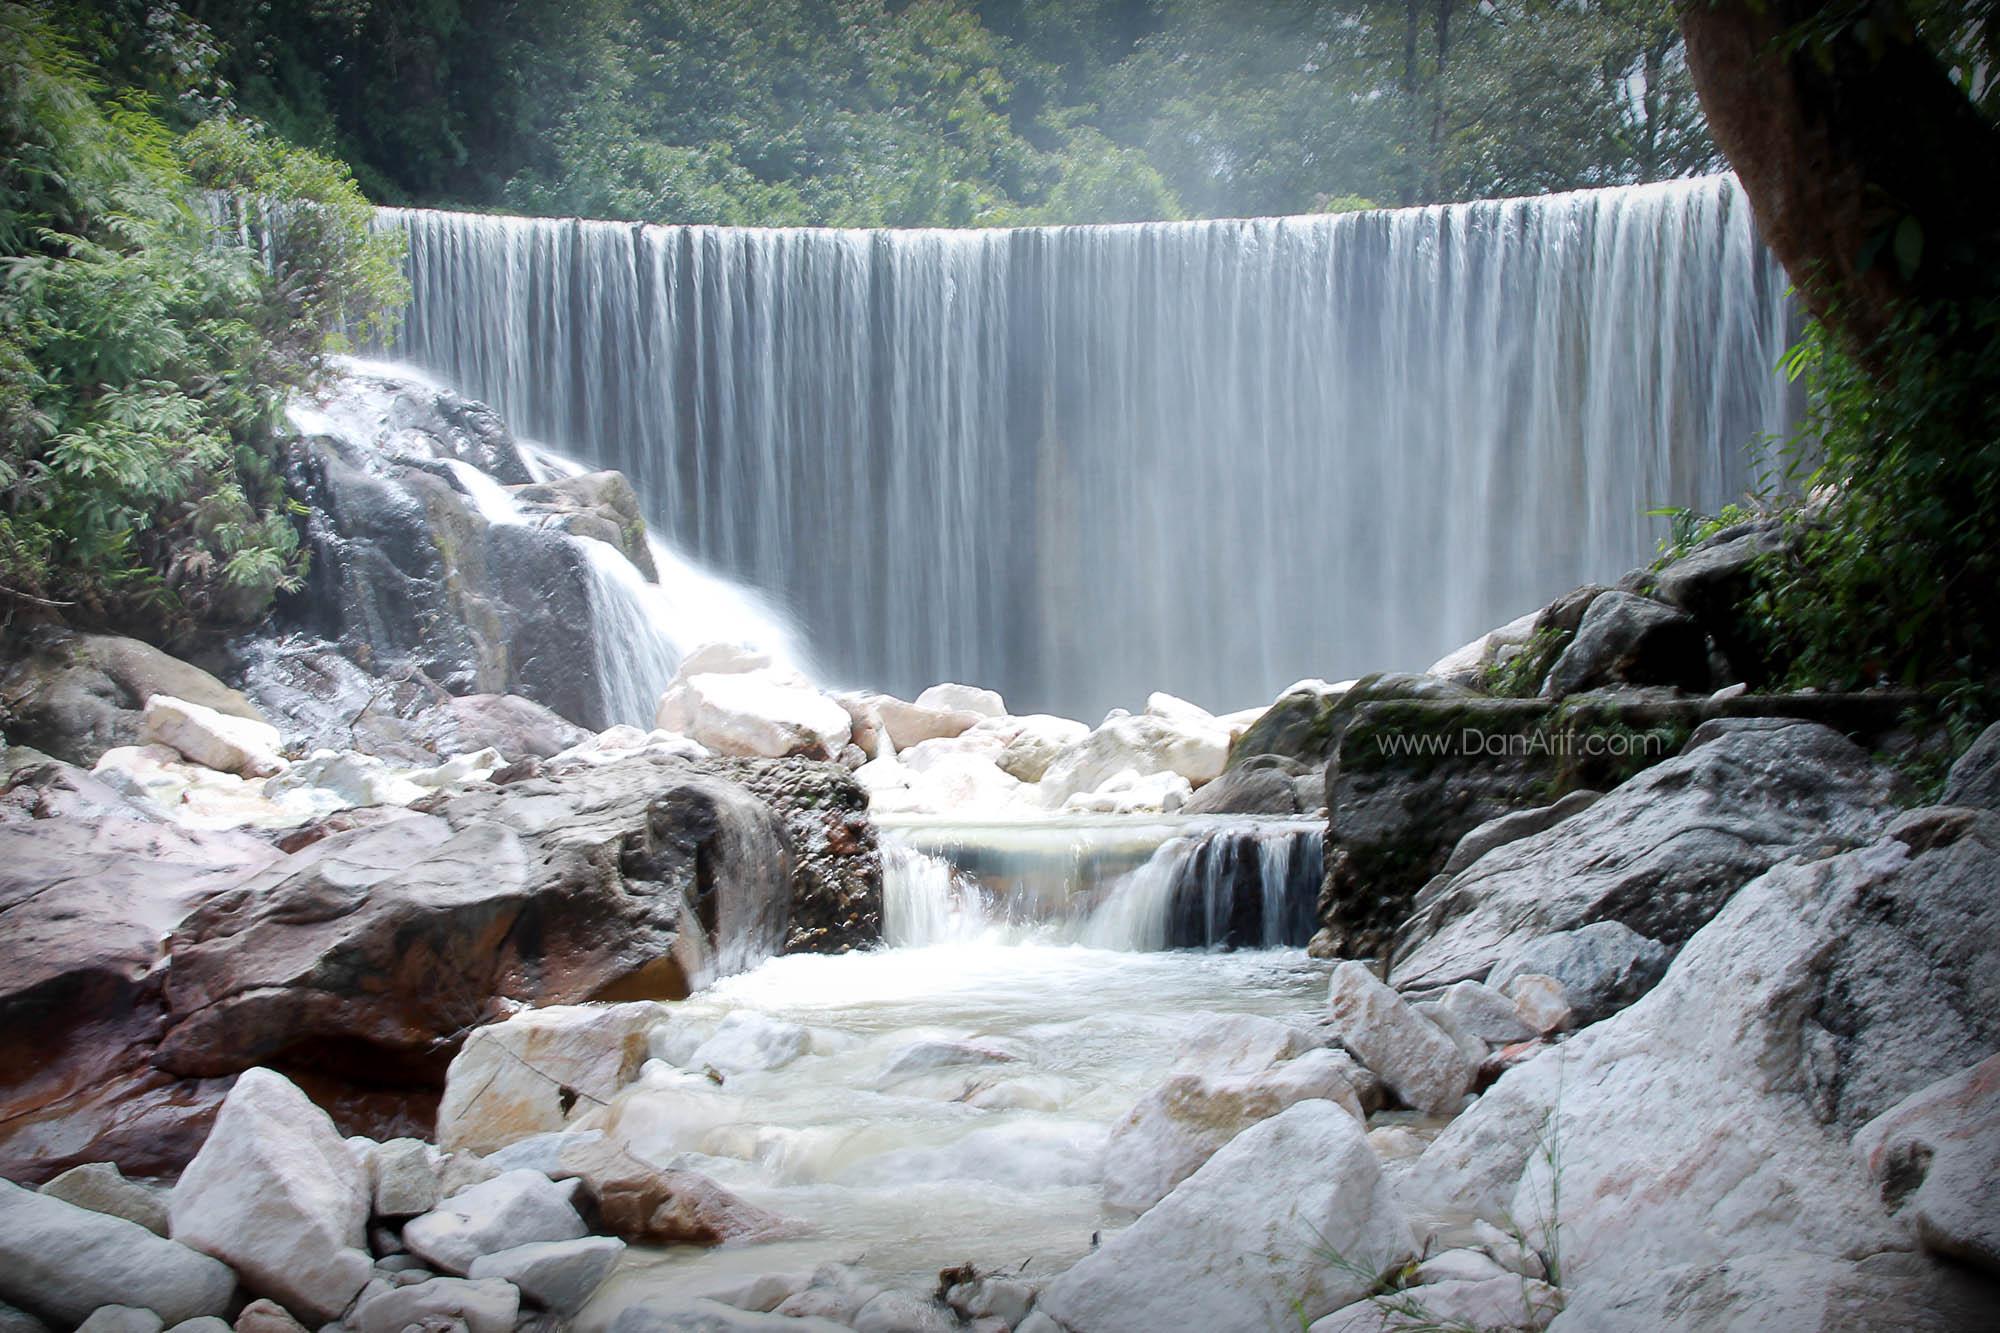 lubuk-timah-17 Of Air Terjun Lubuk Timah Di Perak Lokasi Mandi Manda Yang Sangat Nyaman Untuk Pelancong